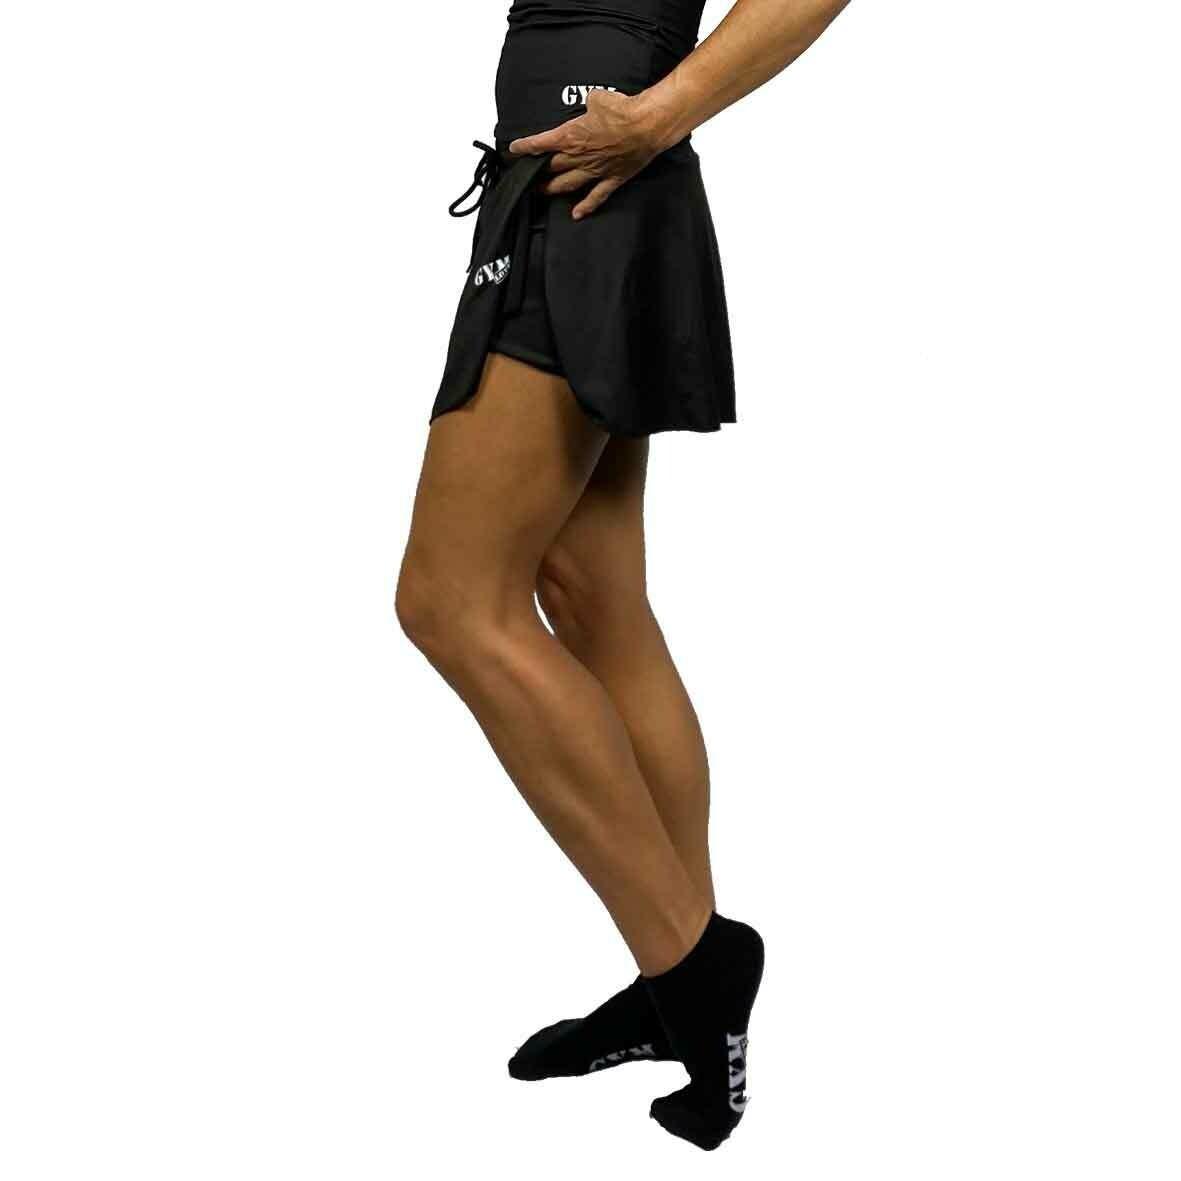 GymLove Skirt-Short Black